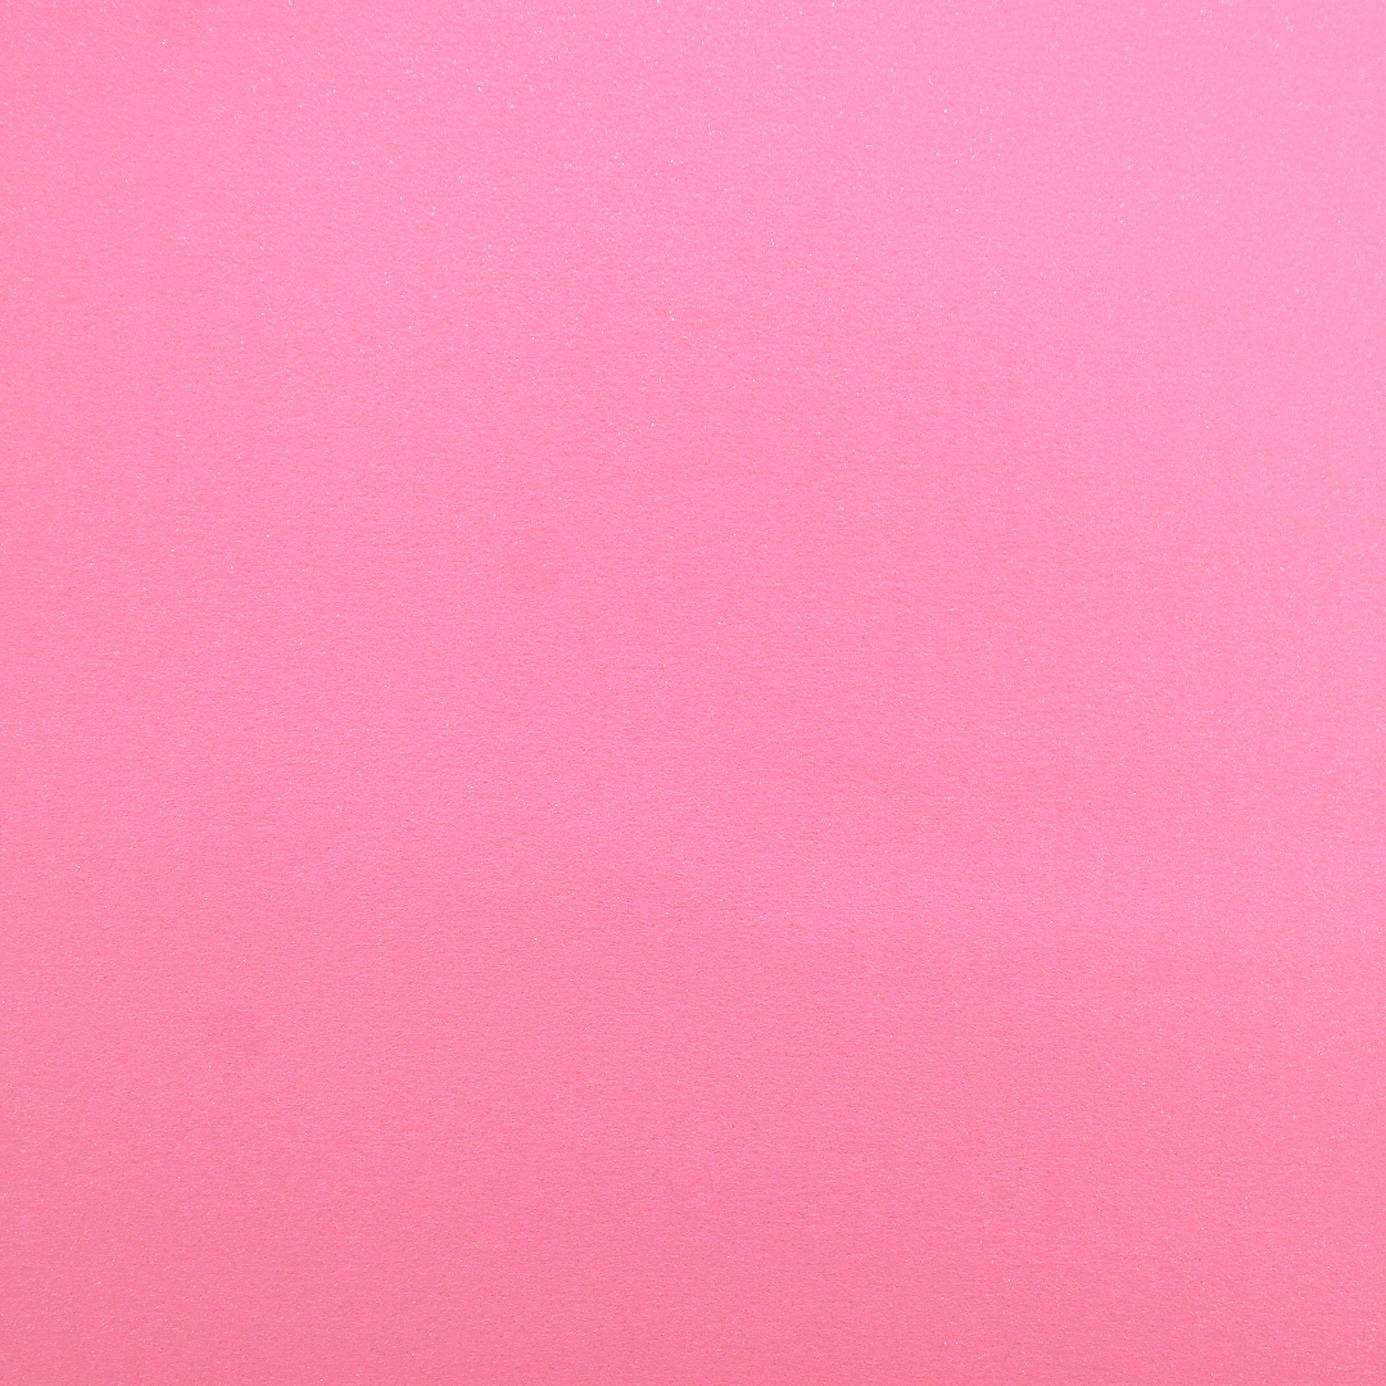 Caselio Love Fabrics Wallpapers Sparkle Plain Wallpaper